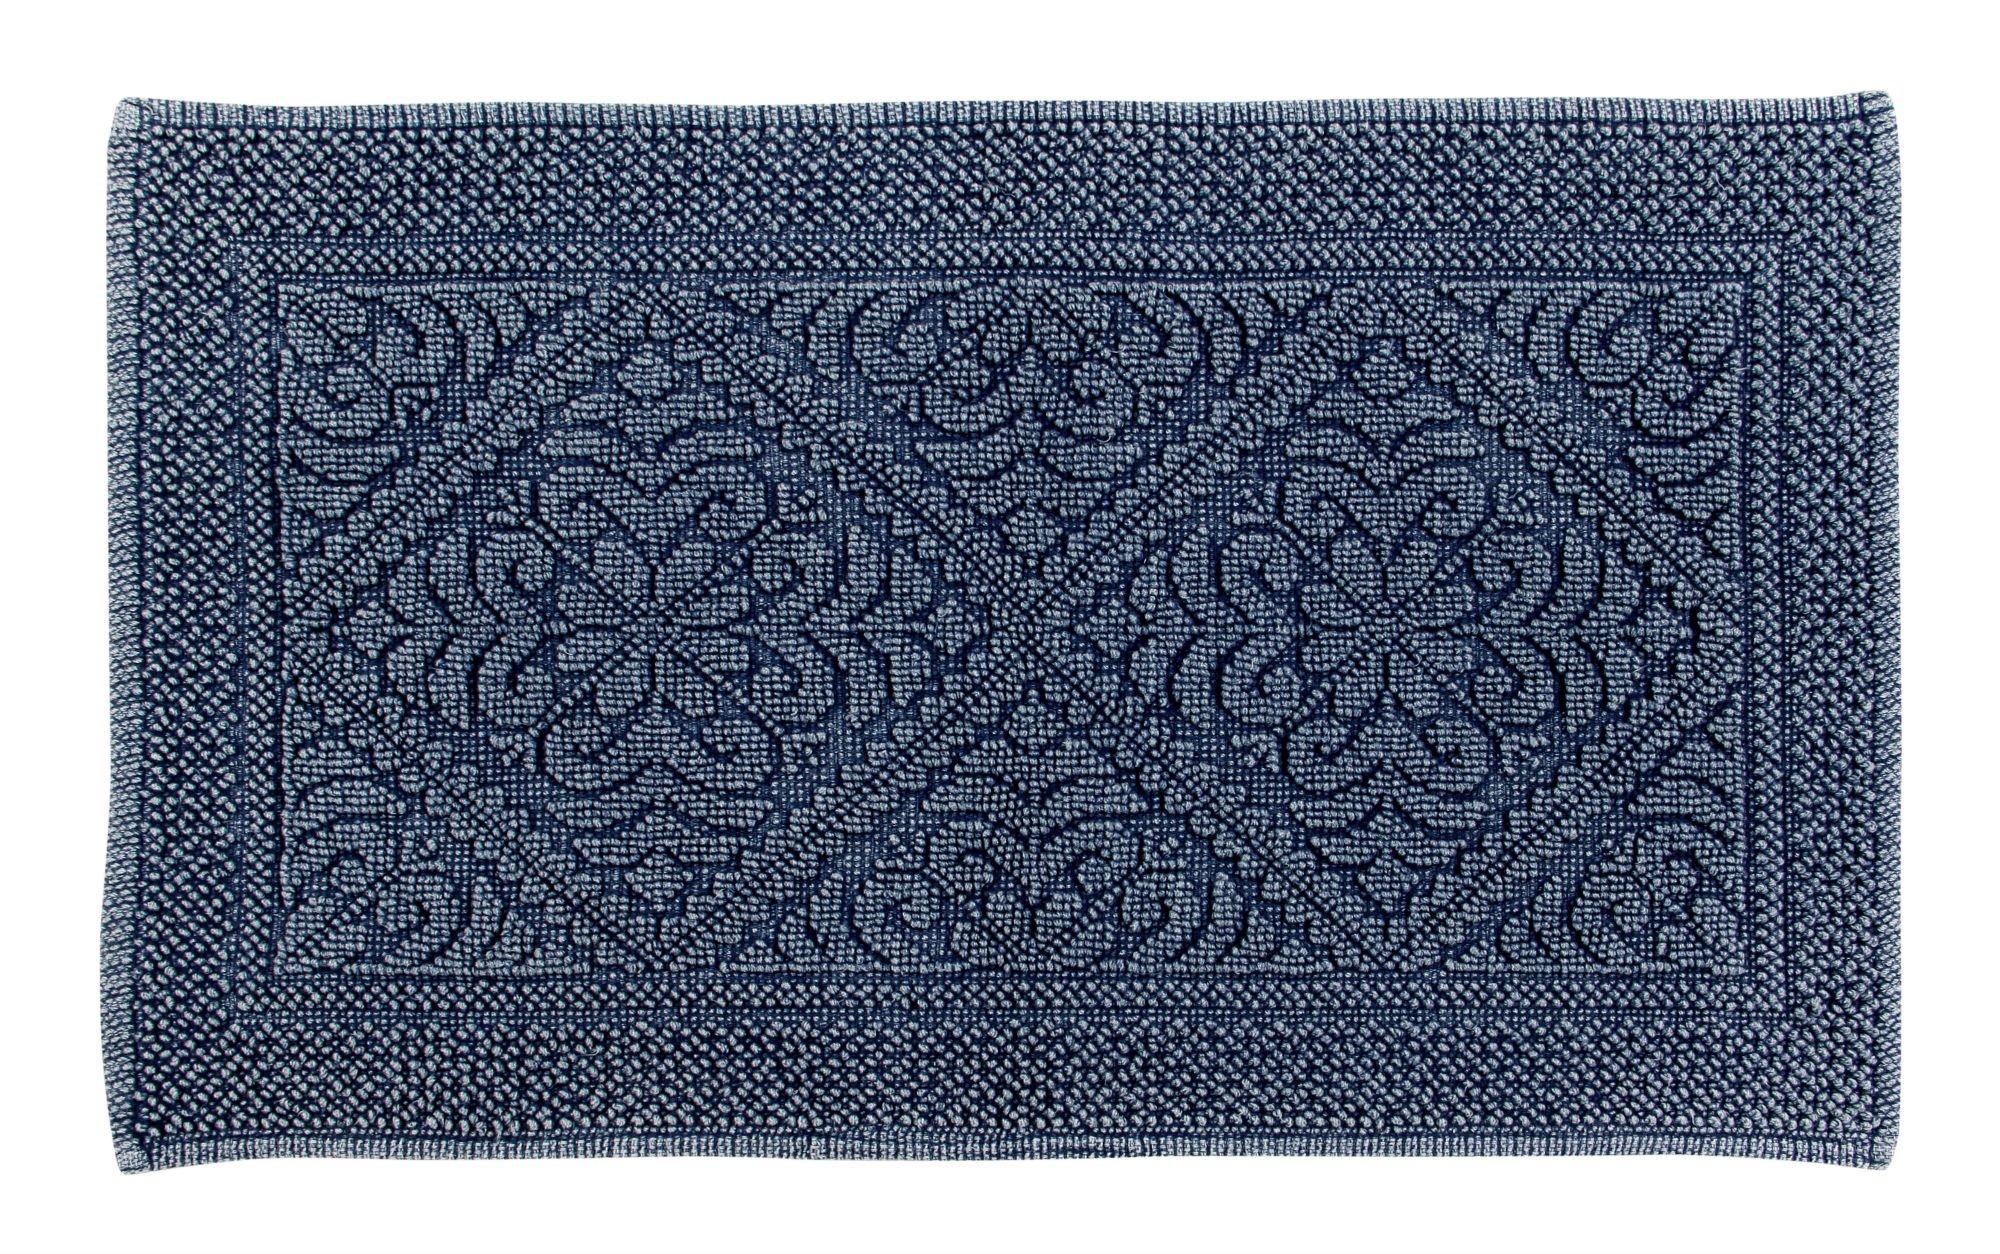 Better Trends/ Pan Overseas BATI2440NV Timeless Stonewash 100% Cotton Bath Mat, 24'' x 40'', Navy